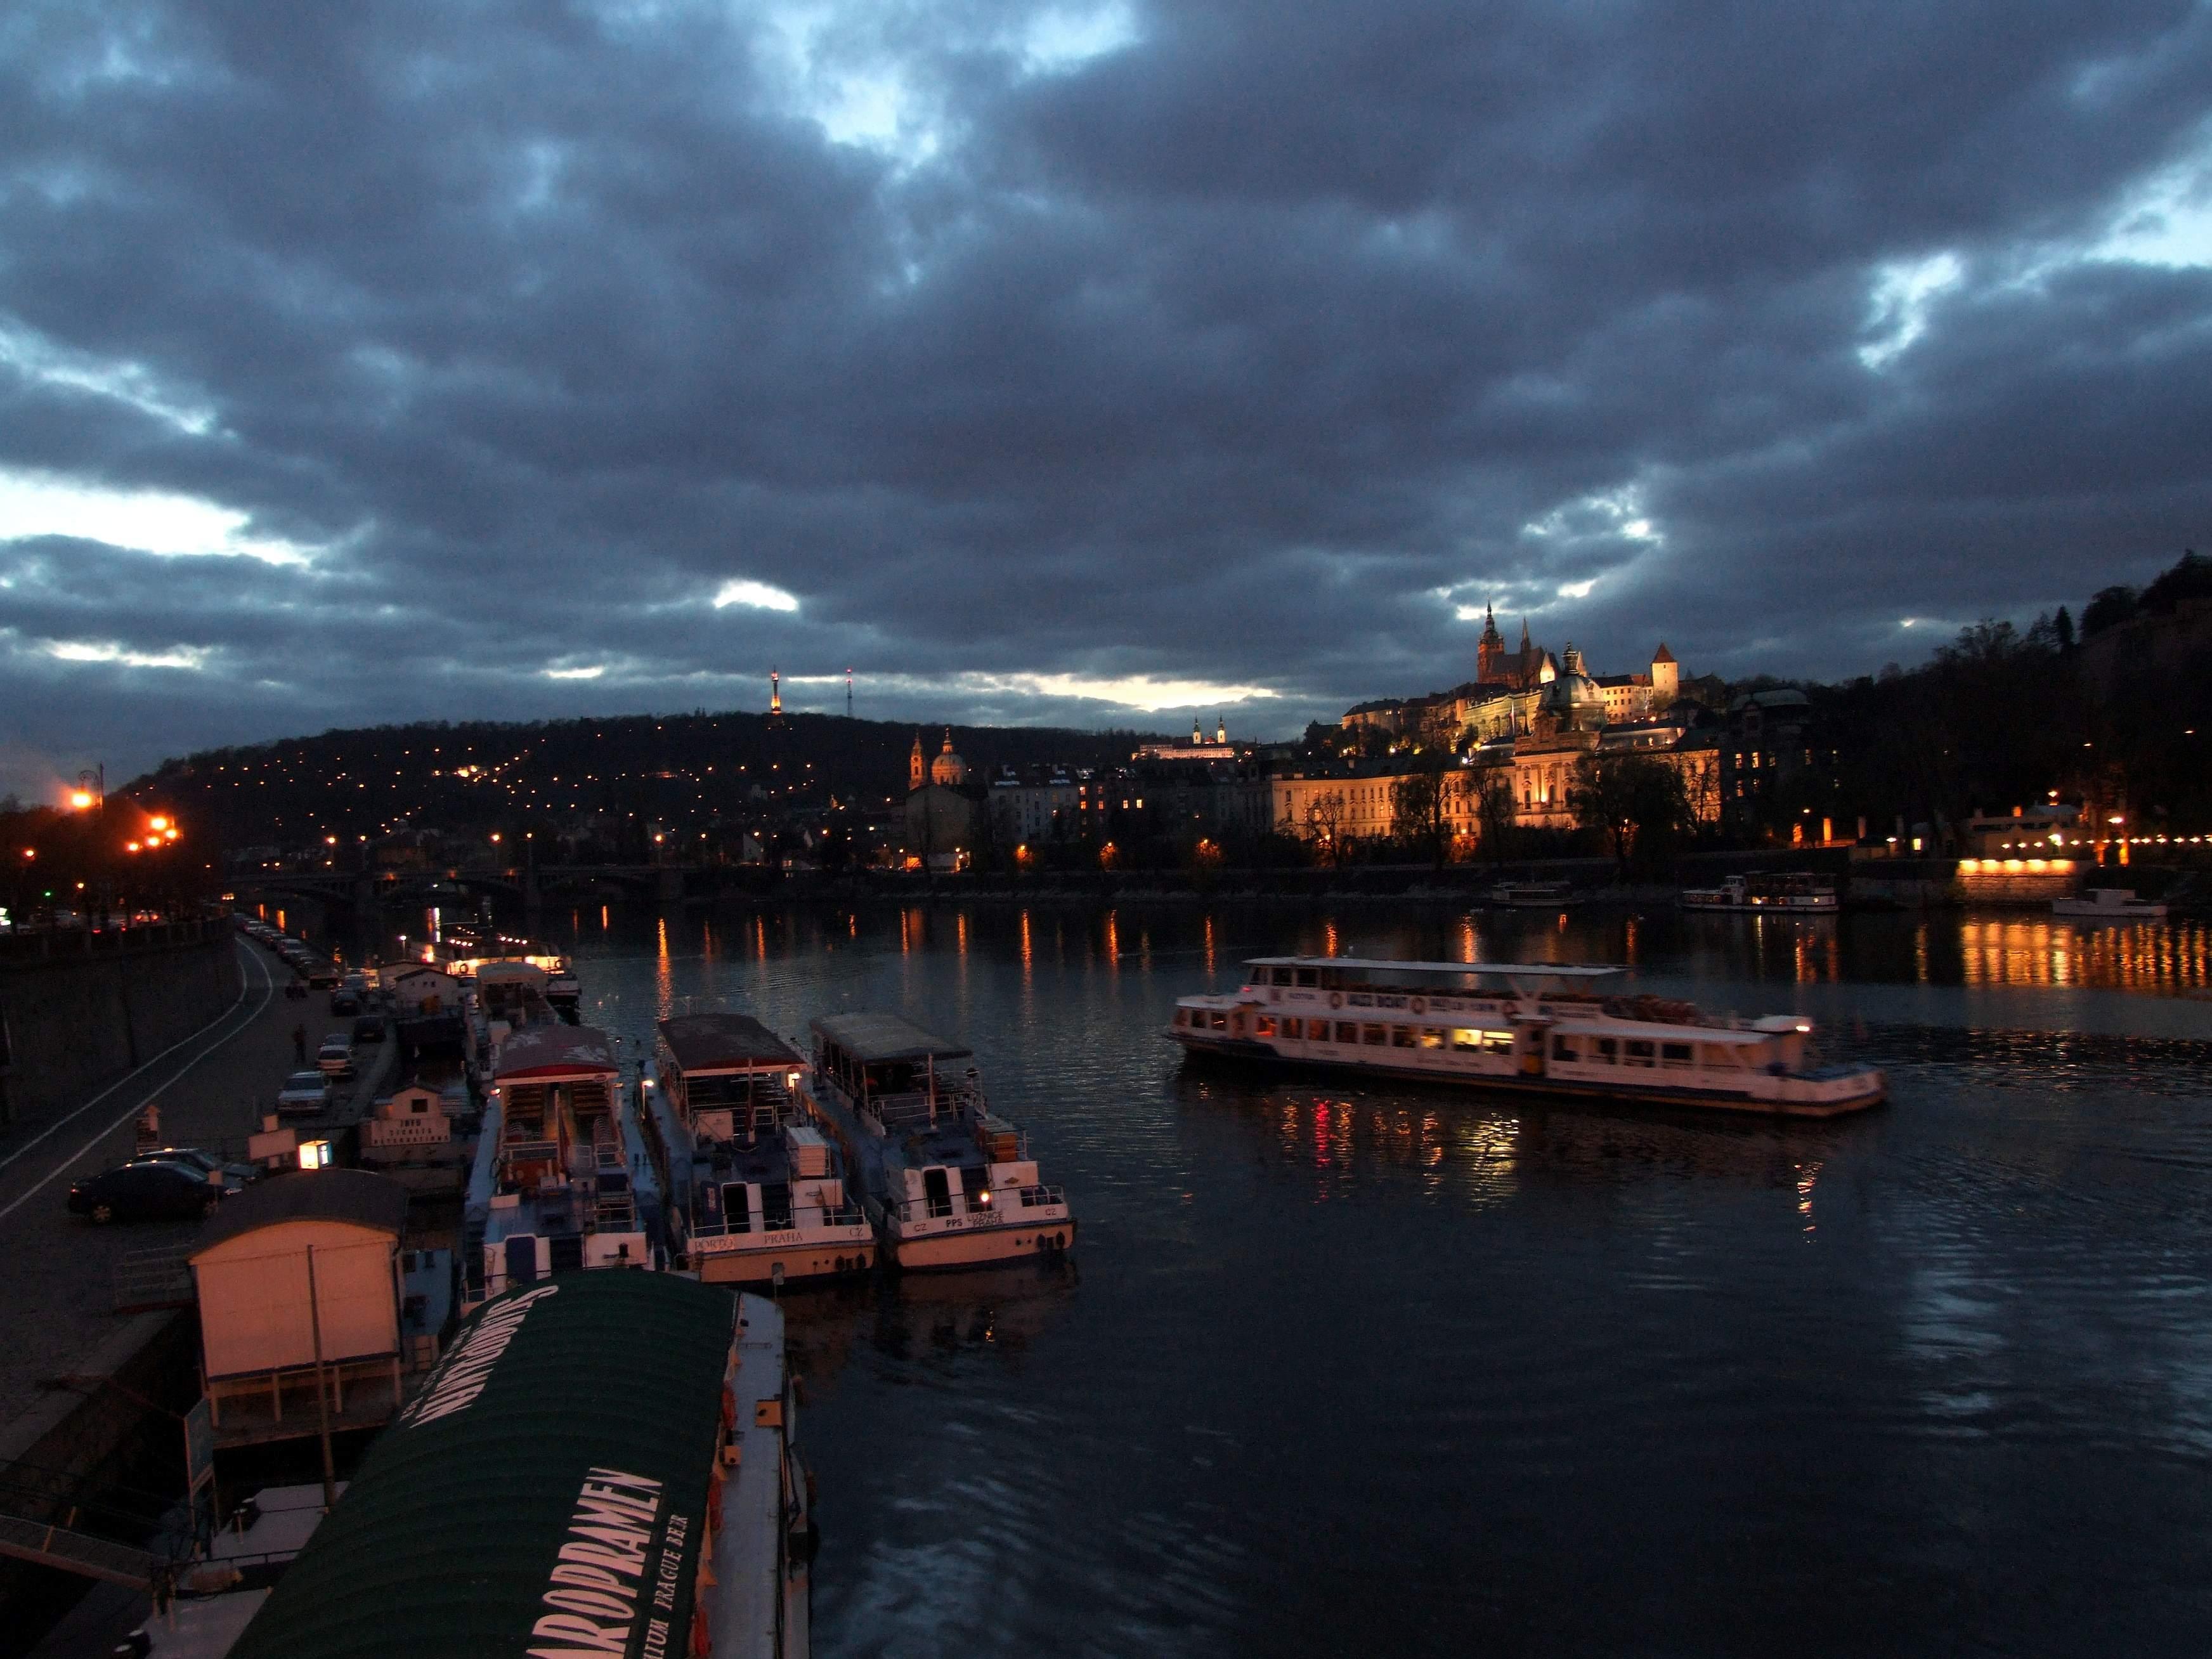 Boats on River Vltava in Praha 2006 - Quelle: WikiCommons